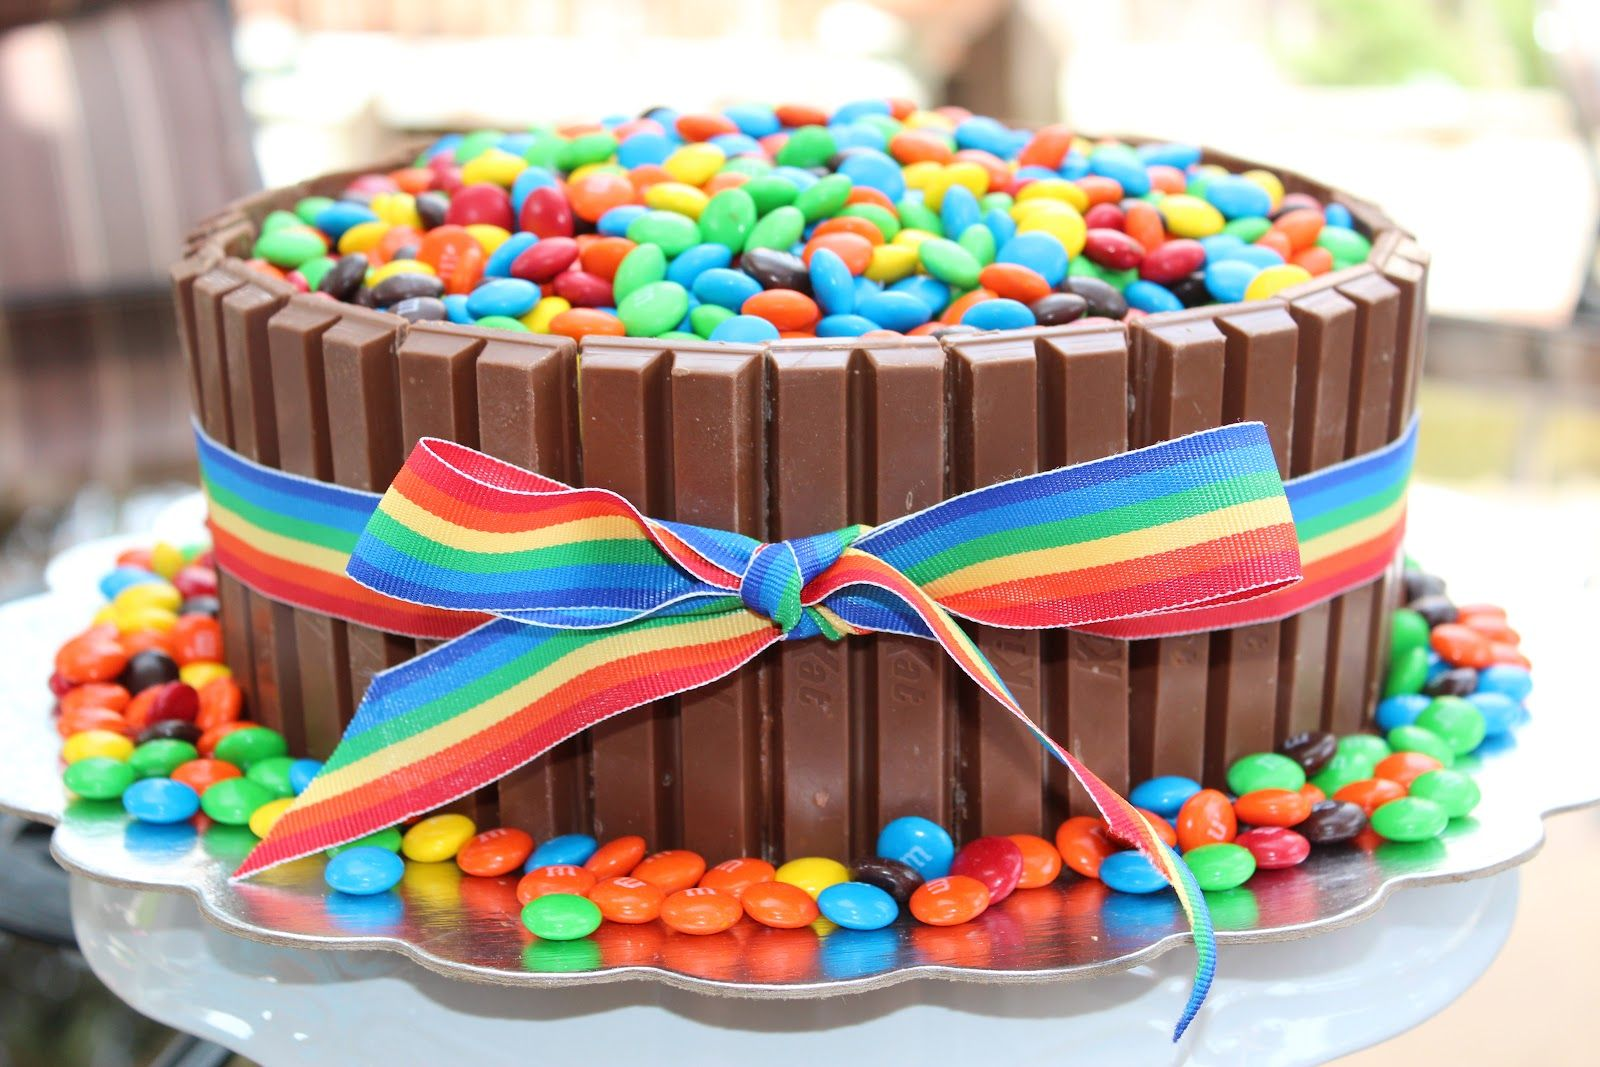 Kit Kat Ice Cream Cake Recipe With MMs Topping